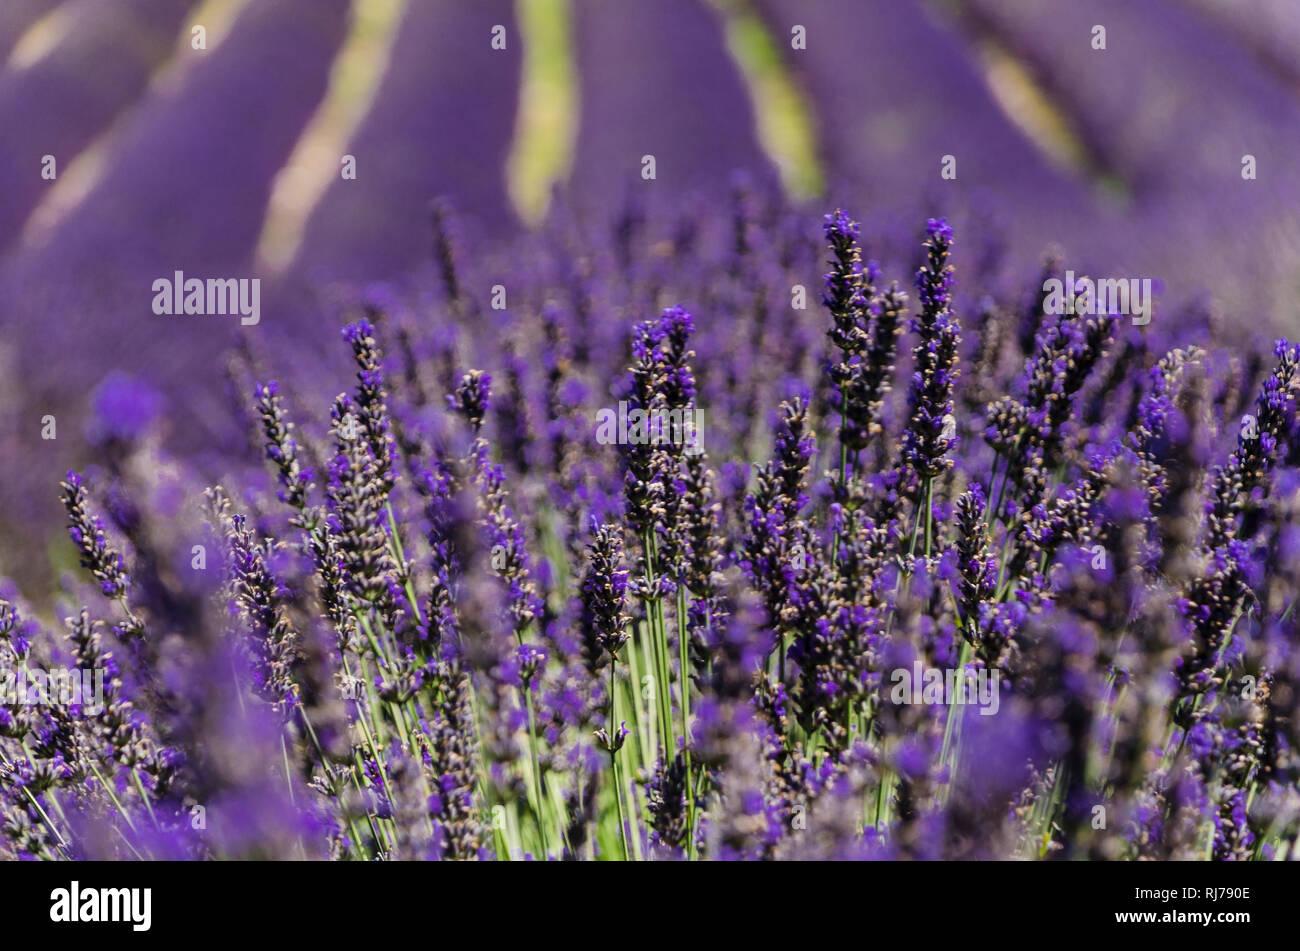 Lavendelfeld bei Sault, Frankreich - Stock Image